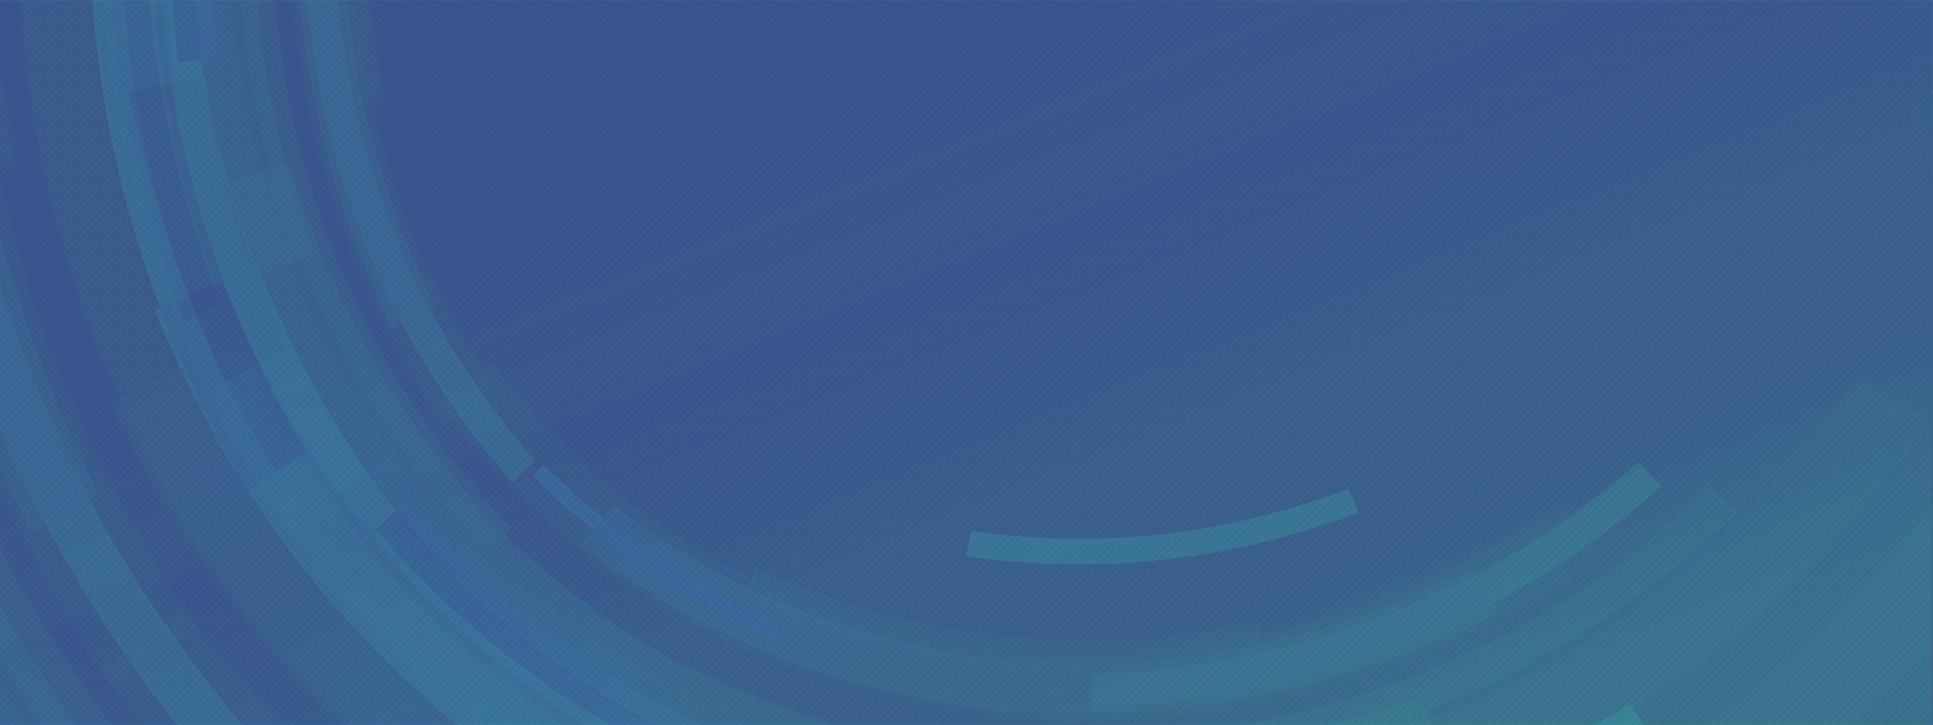 Background0Blue Educyber